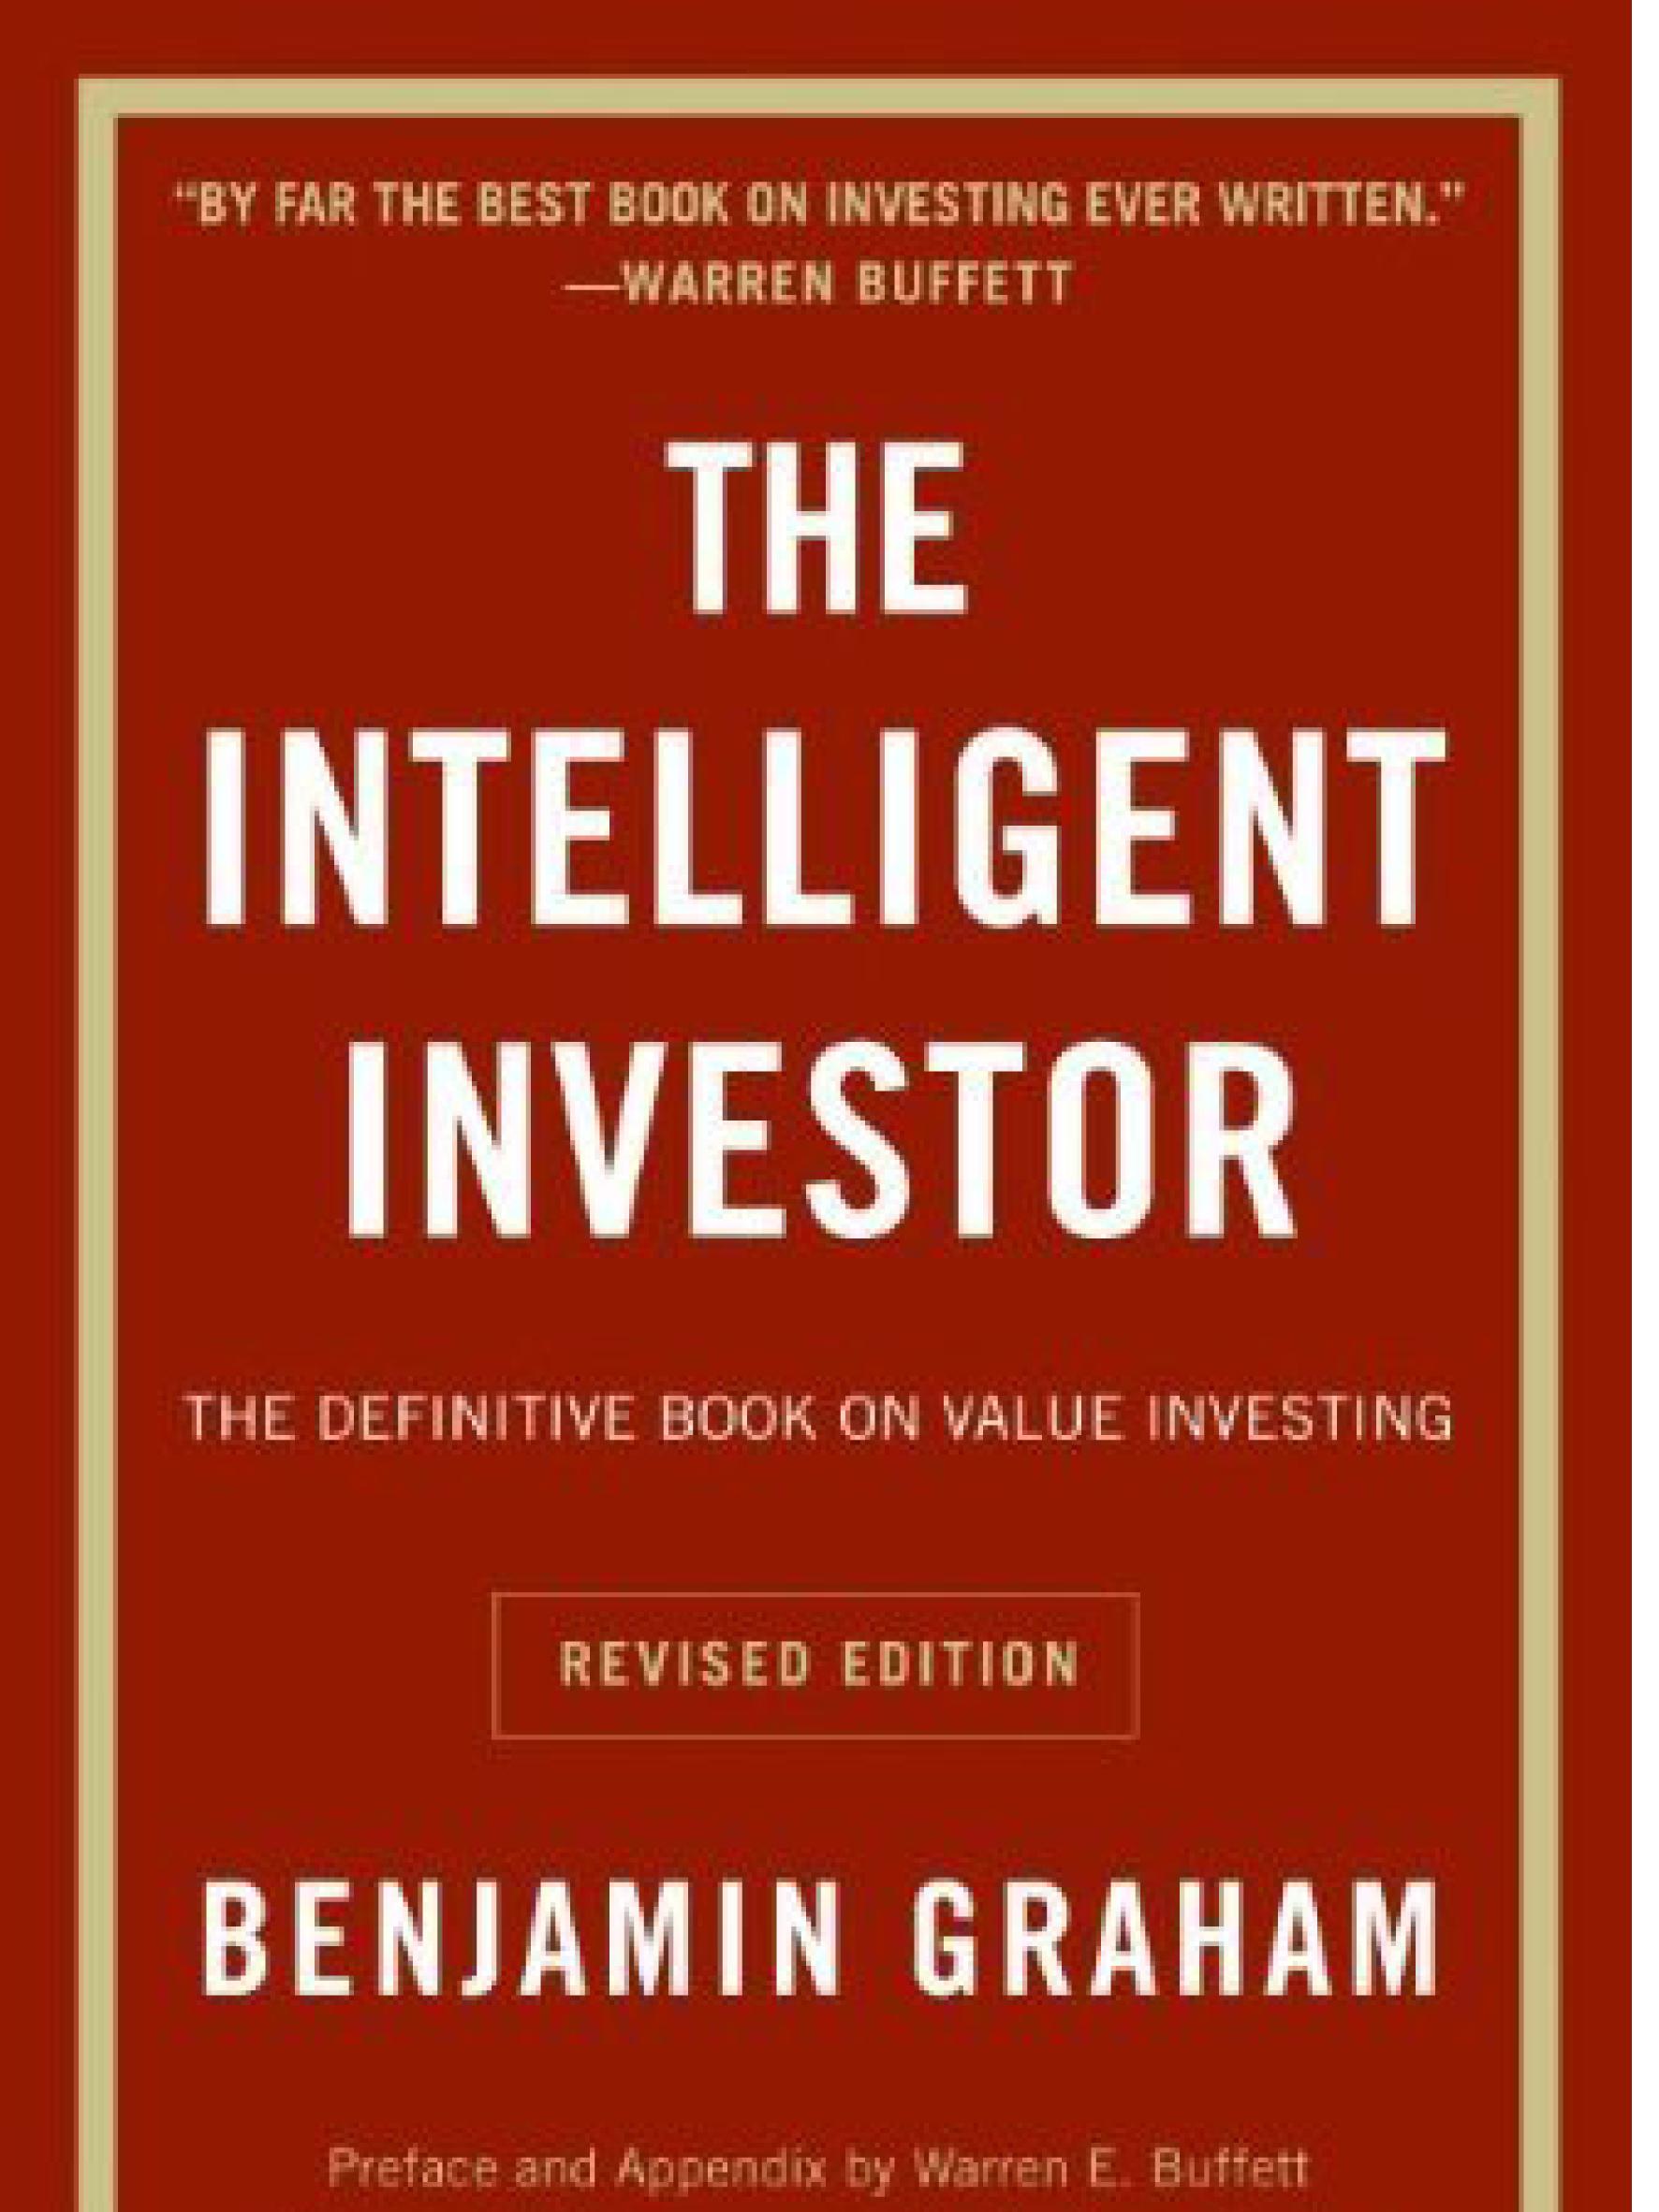 The Intelligent Investor.     Benjamin Graham    2003 (Revised Edition)